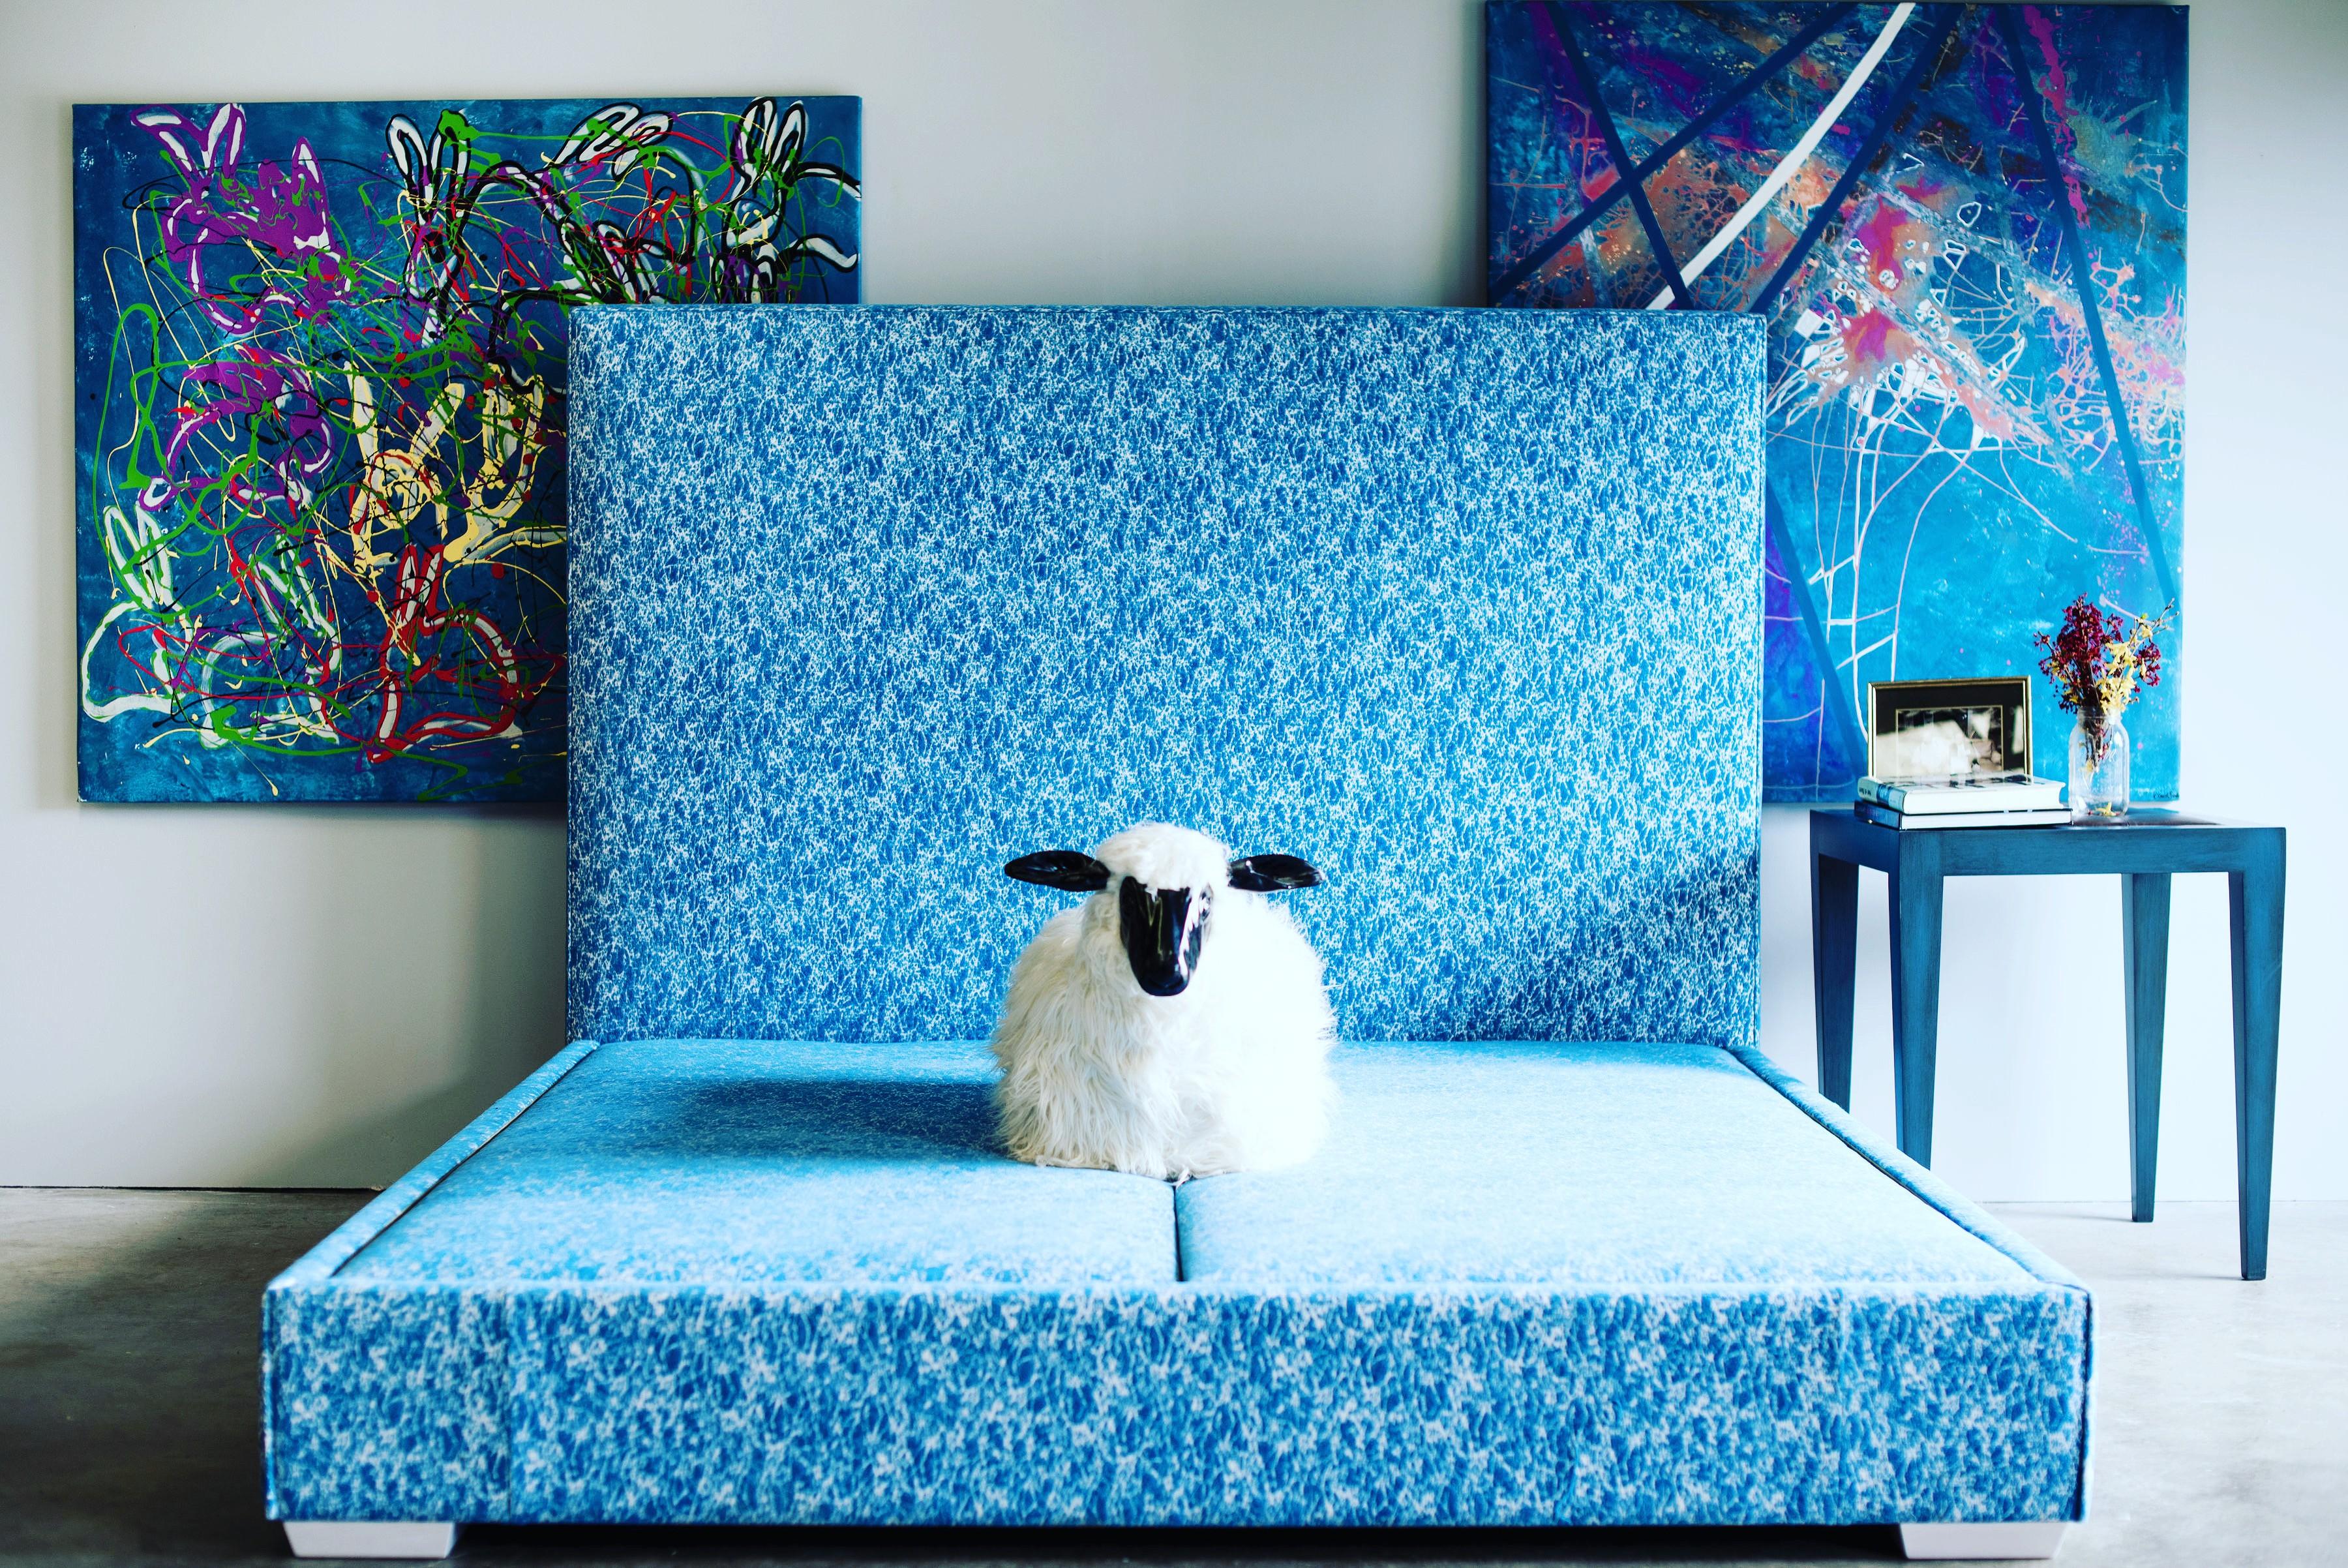 stewart furniture design, inc. | linkedin